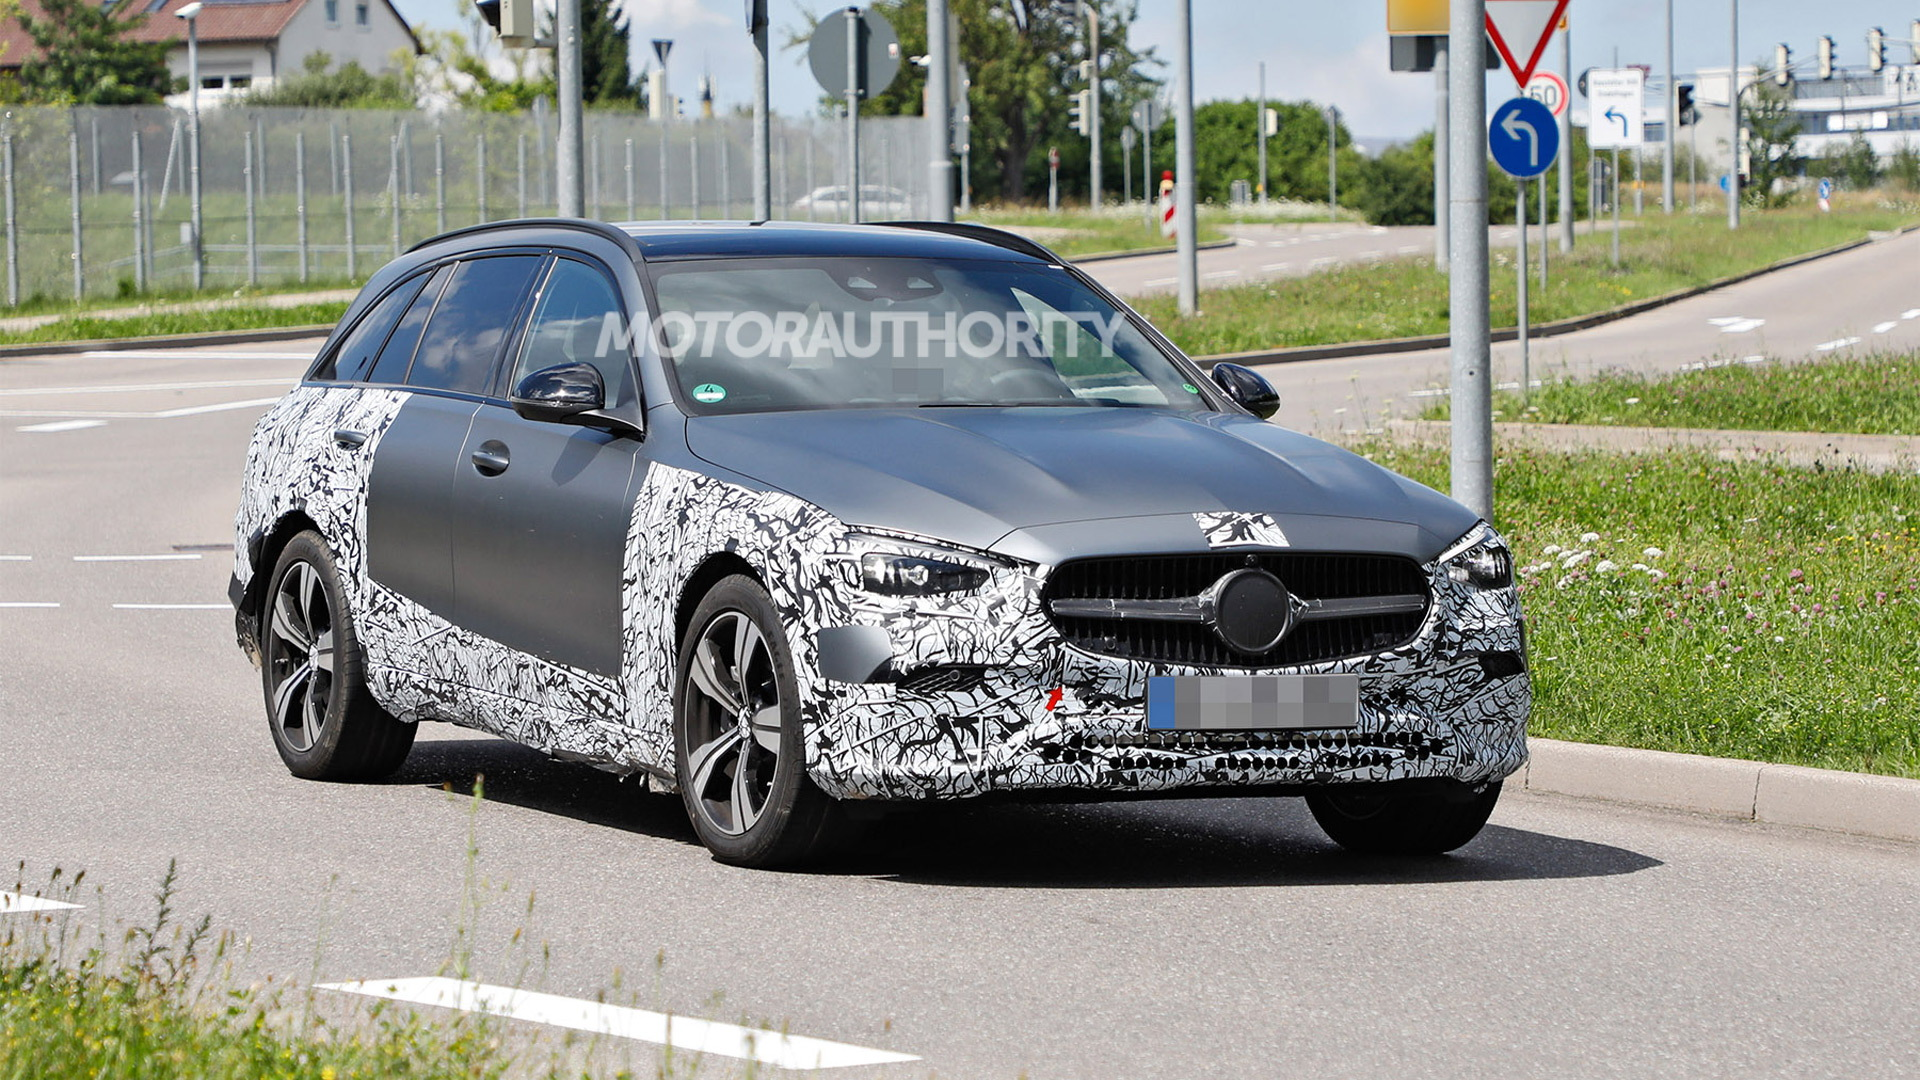 2022 Mercedes-Benz C-Class All-Terrain spy shots - Photo credit:S. Baldauf/SB-Medien